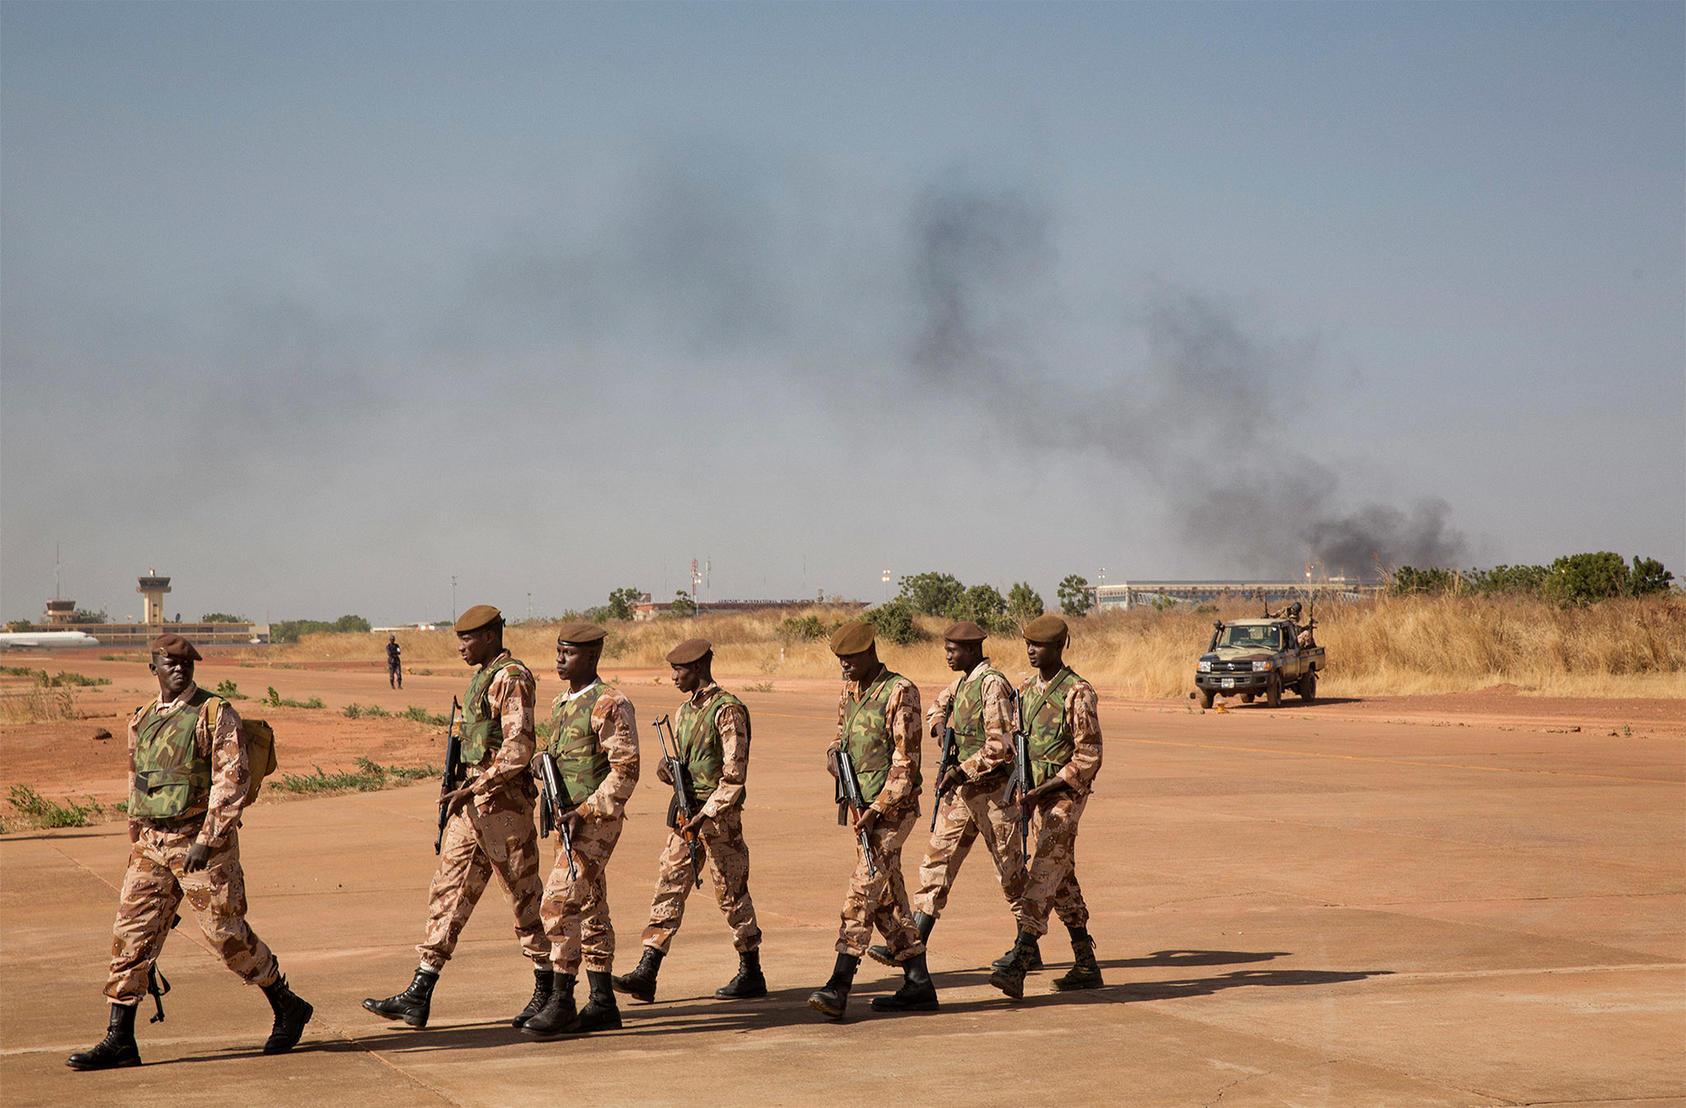 Malian soldiers patrol an airbase in Bamako, Mali, Jan. 16, 2013. (Marco Gualazzini/The New York Times)